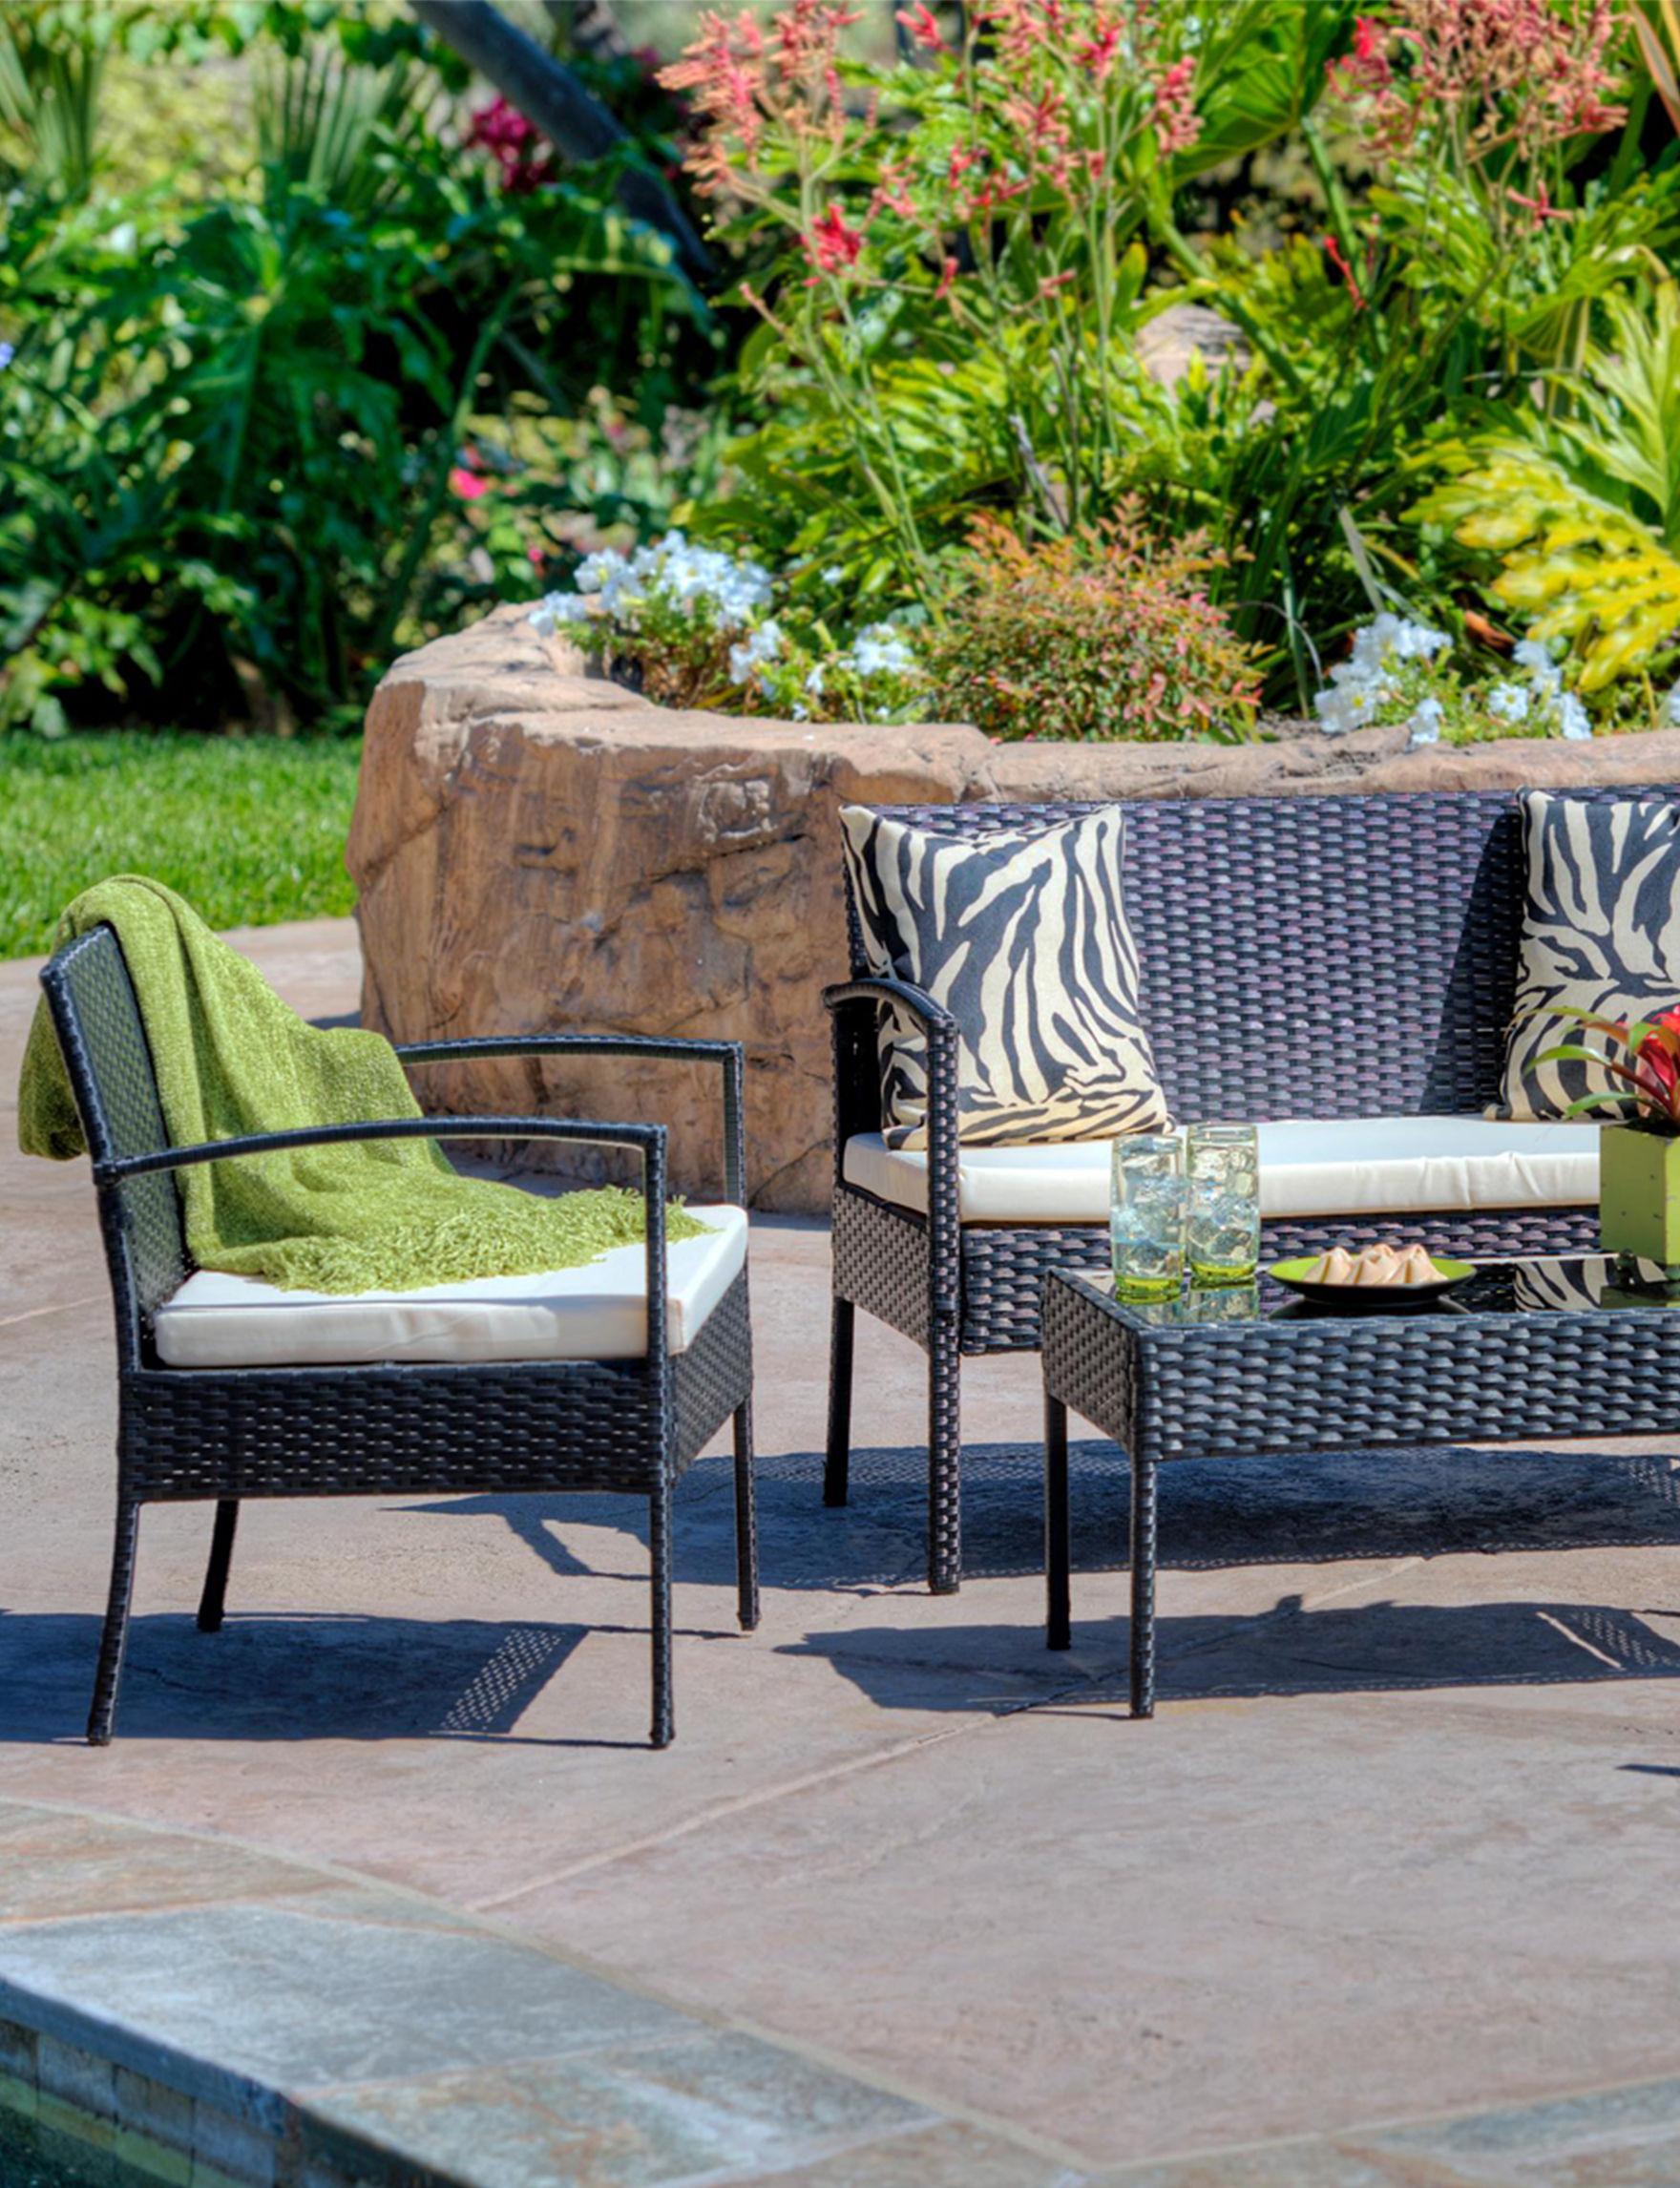 6 Pc Patio Set With Umbrella: Thy-Hom 4-pc. Tea Set All-Weather Wicker Patio Seating Set